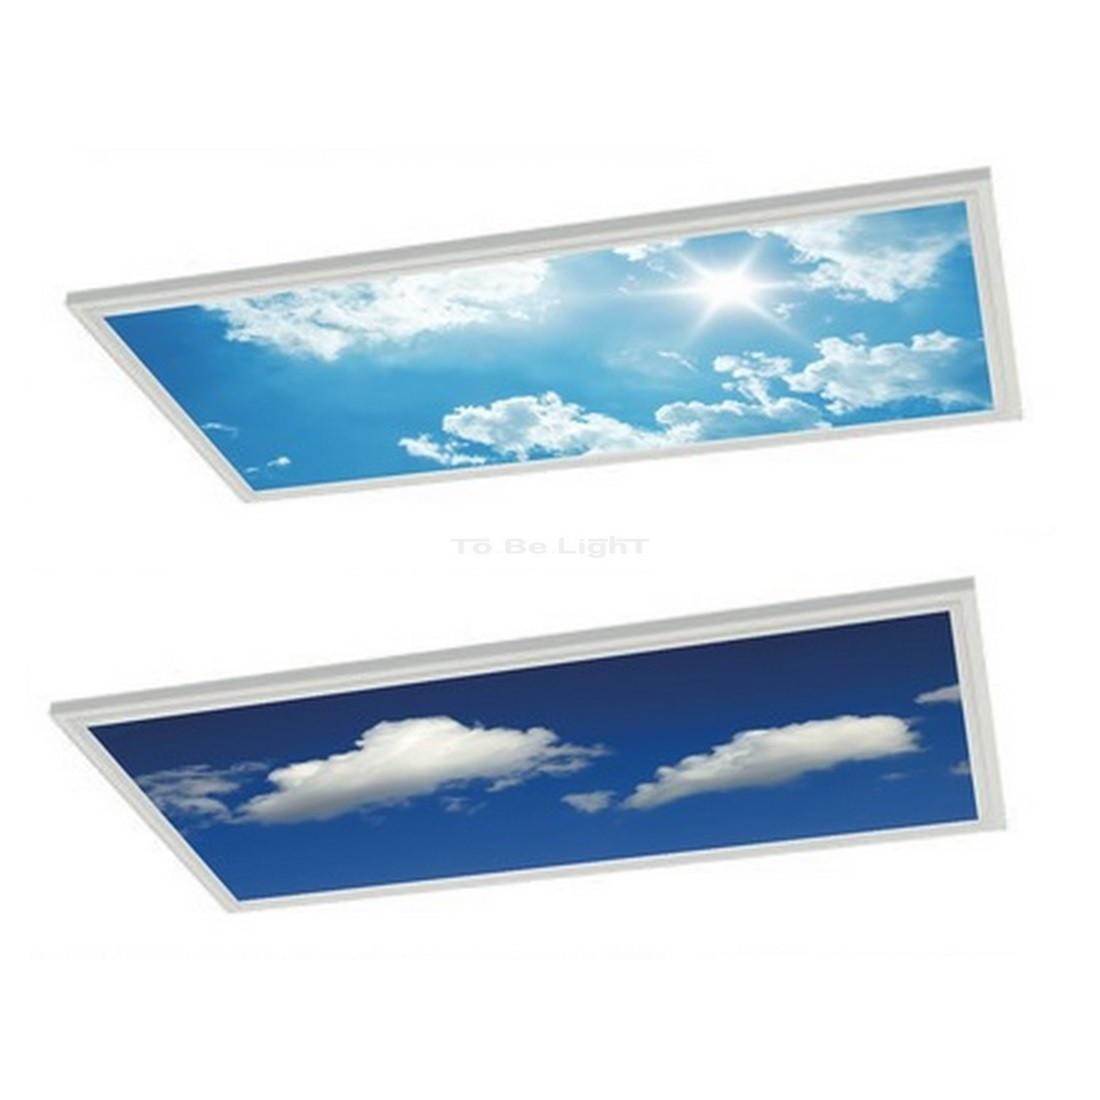 dalle led oasis ciel mirage sky 300x1200 personnalisable. Black Bedroom Furniture Sets. Home Design Ideas